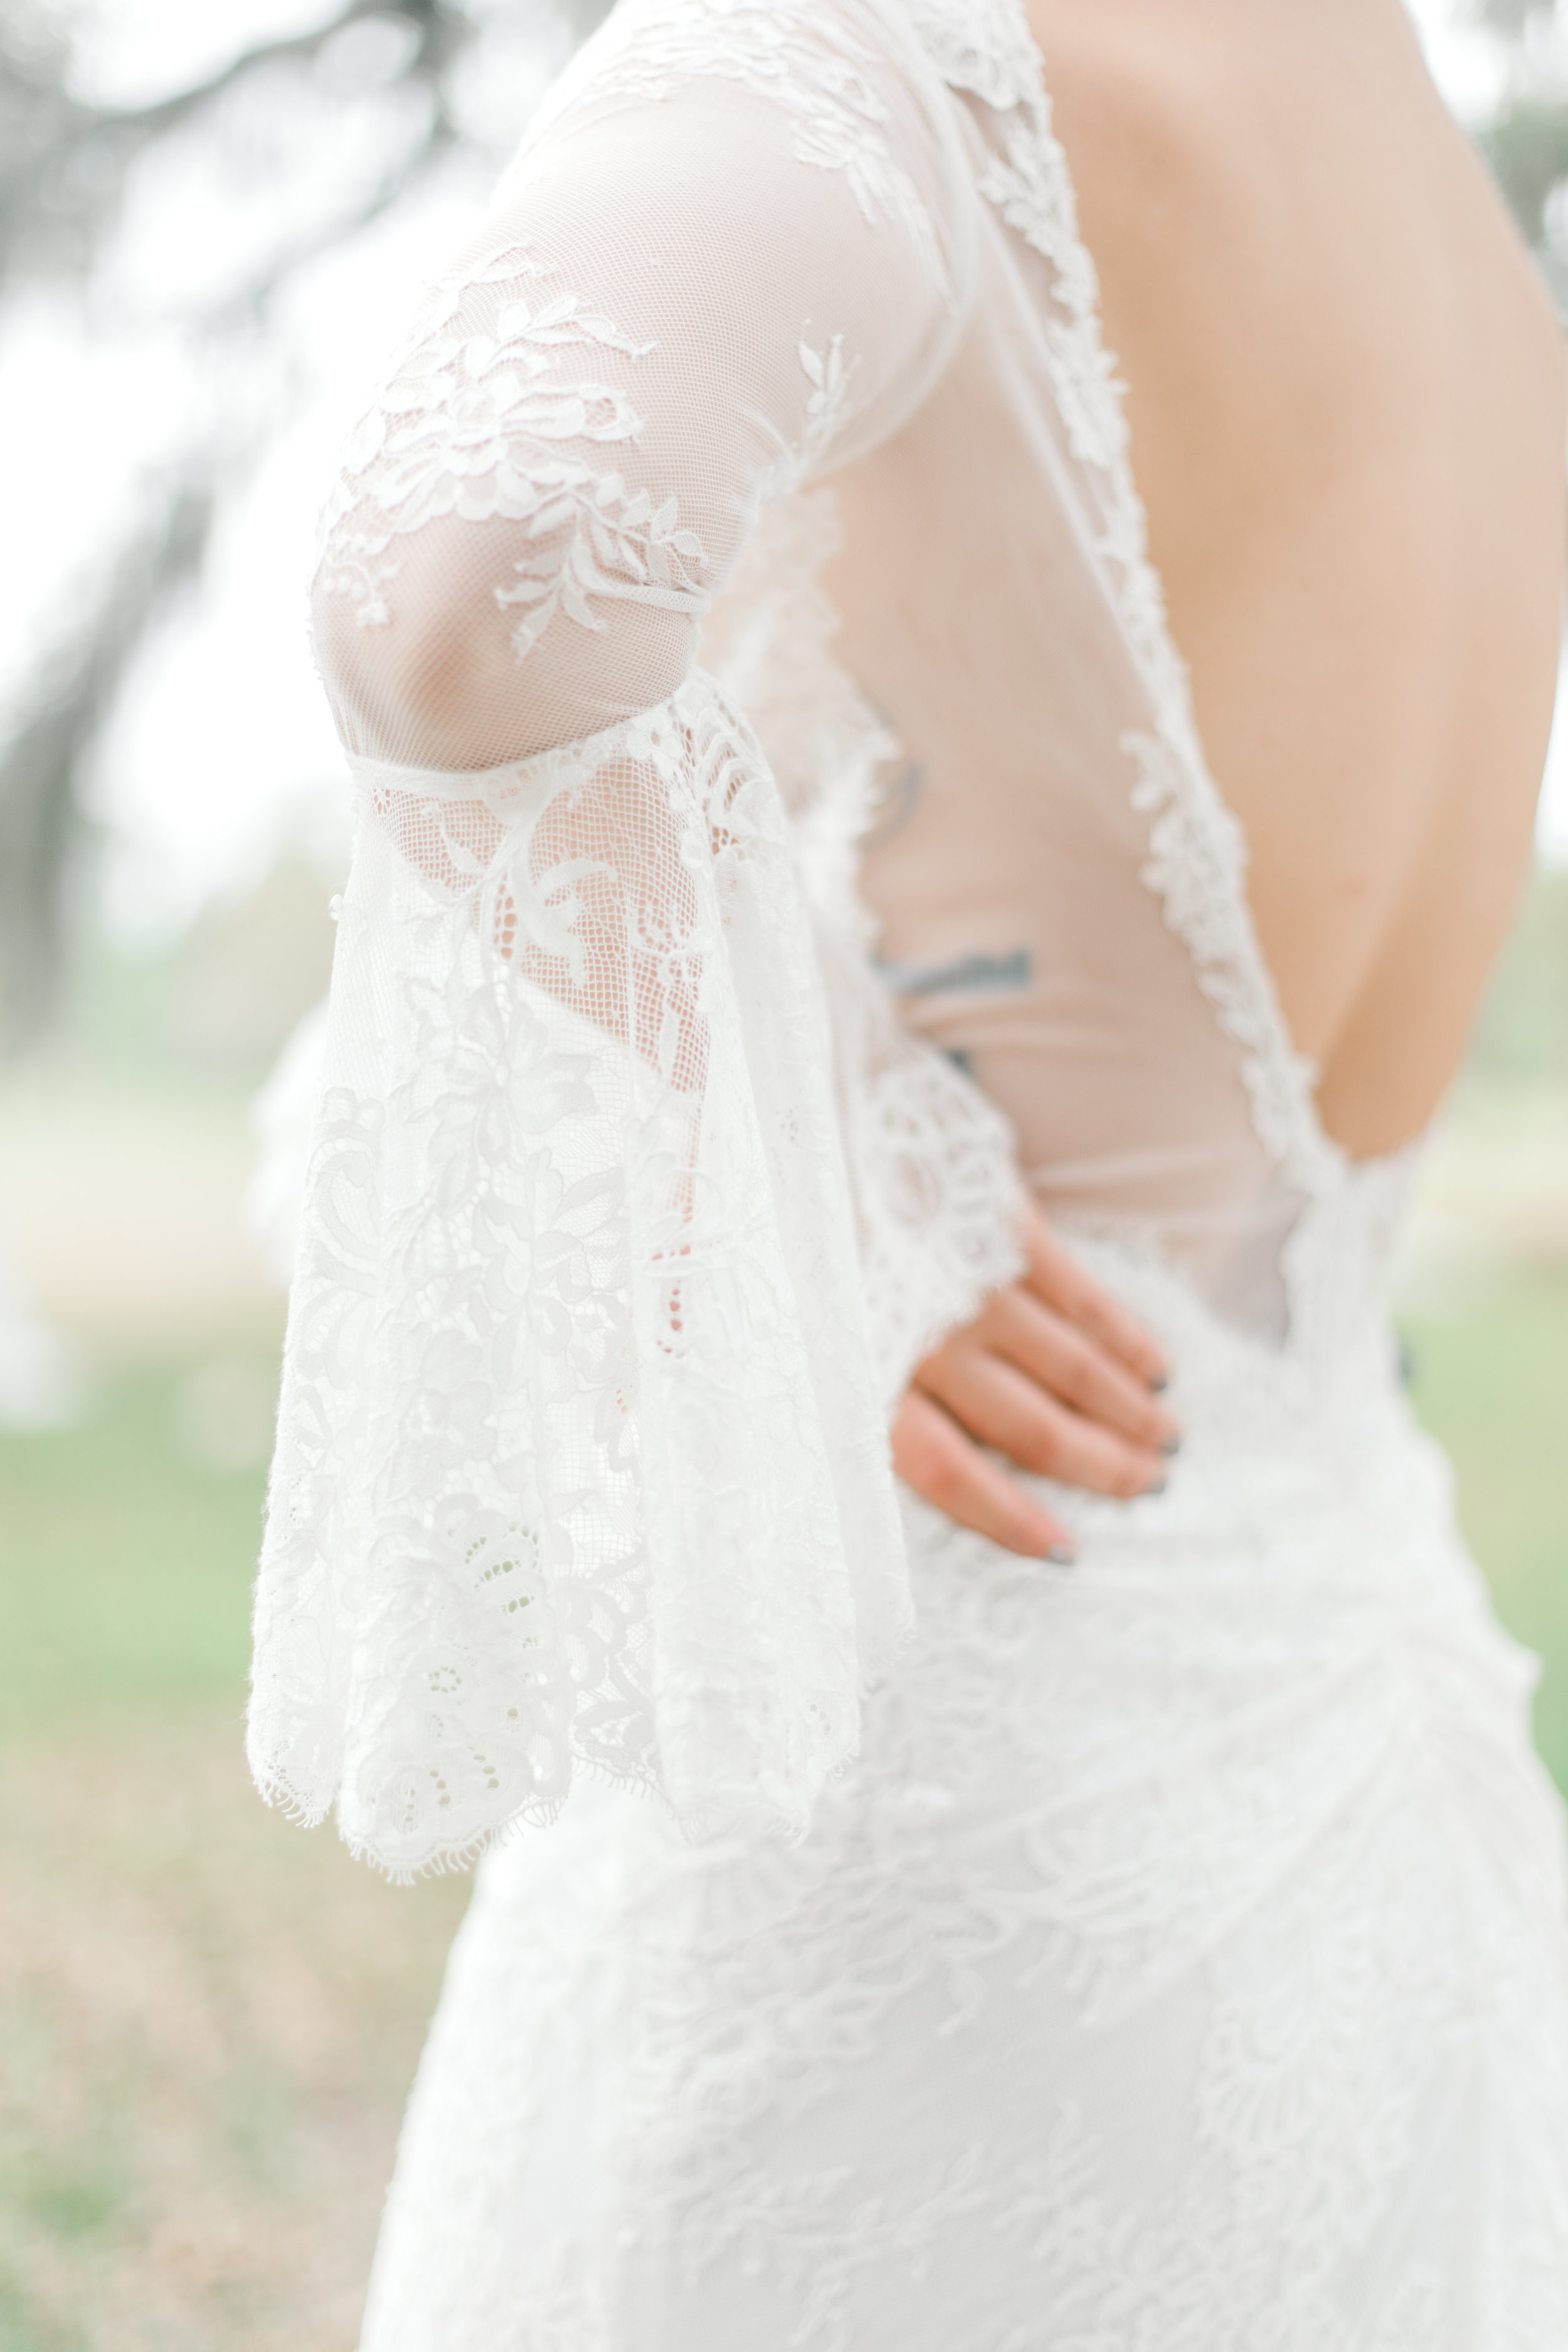 lamour-by-calla-blanche-amber-wedding-dress-long-sleeve-wedding-dress-wormsloe-wedding-inspiration-wormsloe-historic-site-wormsloe-elopement-savannah-wedding-dresses-savannah-elopements-Selyciayangphotograpy-56.jpg